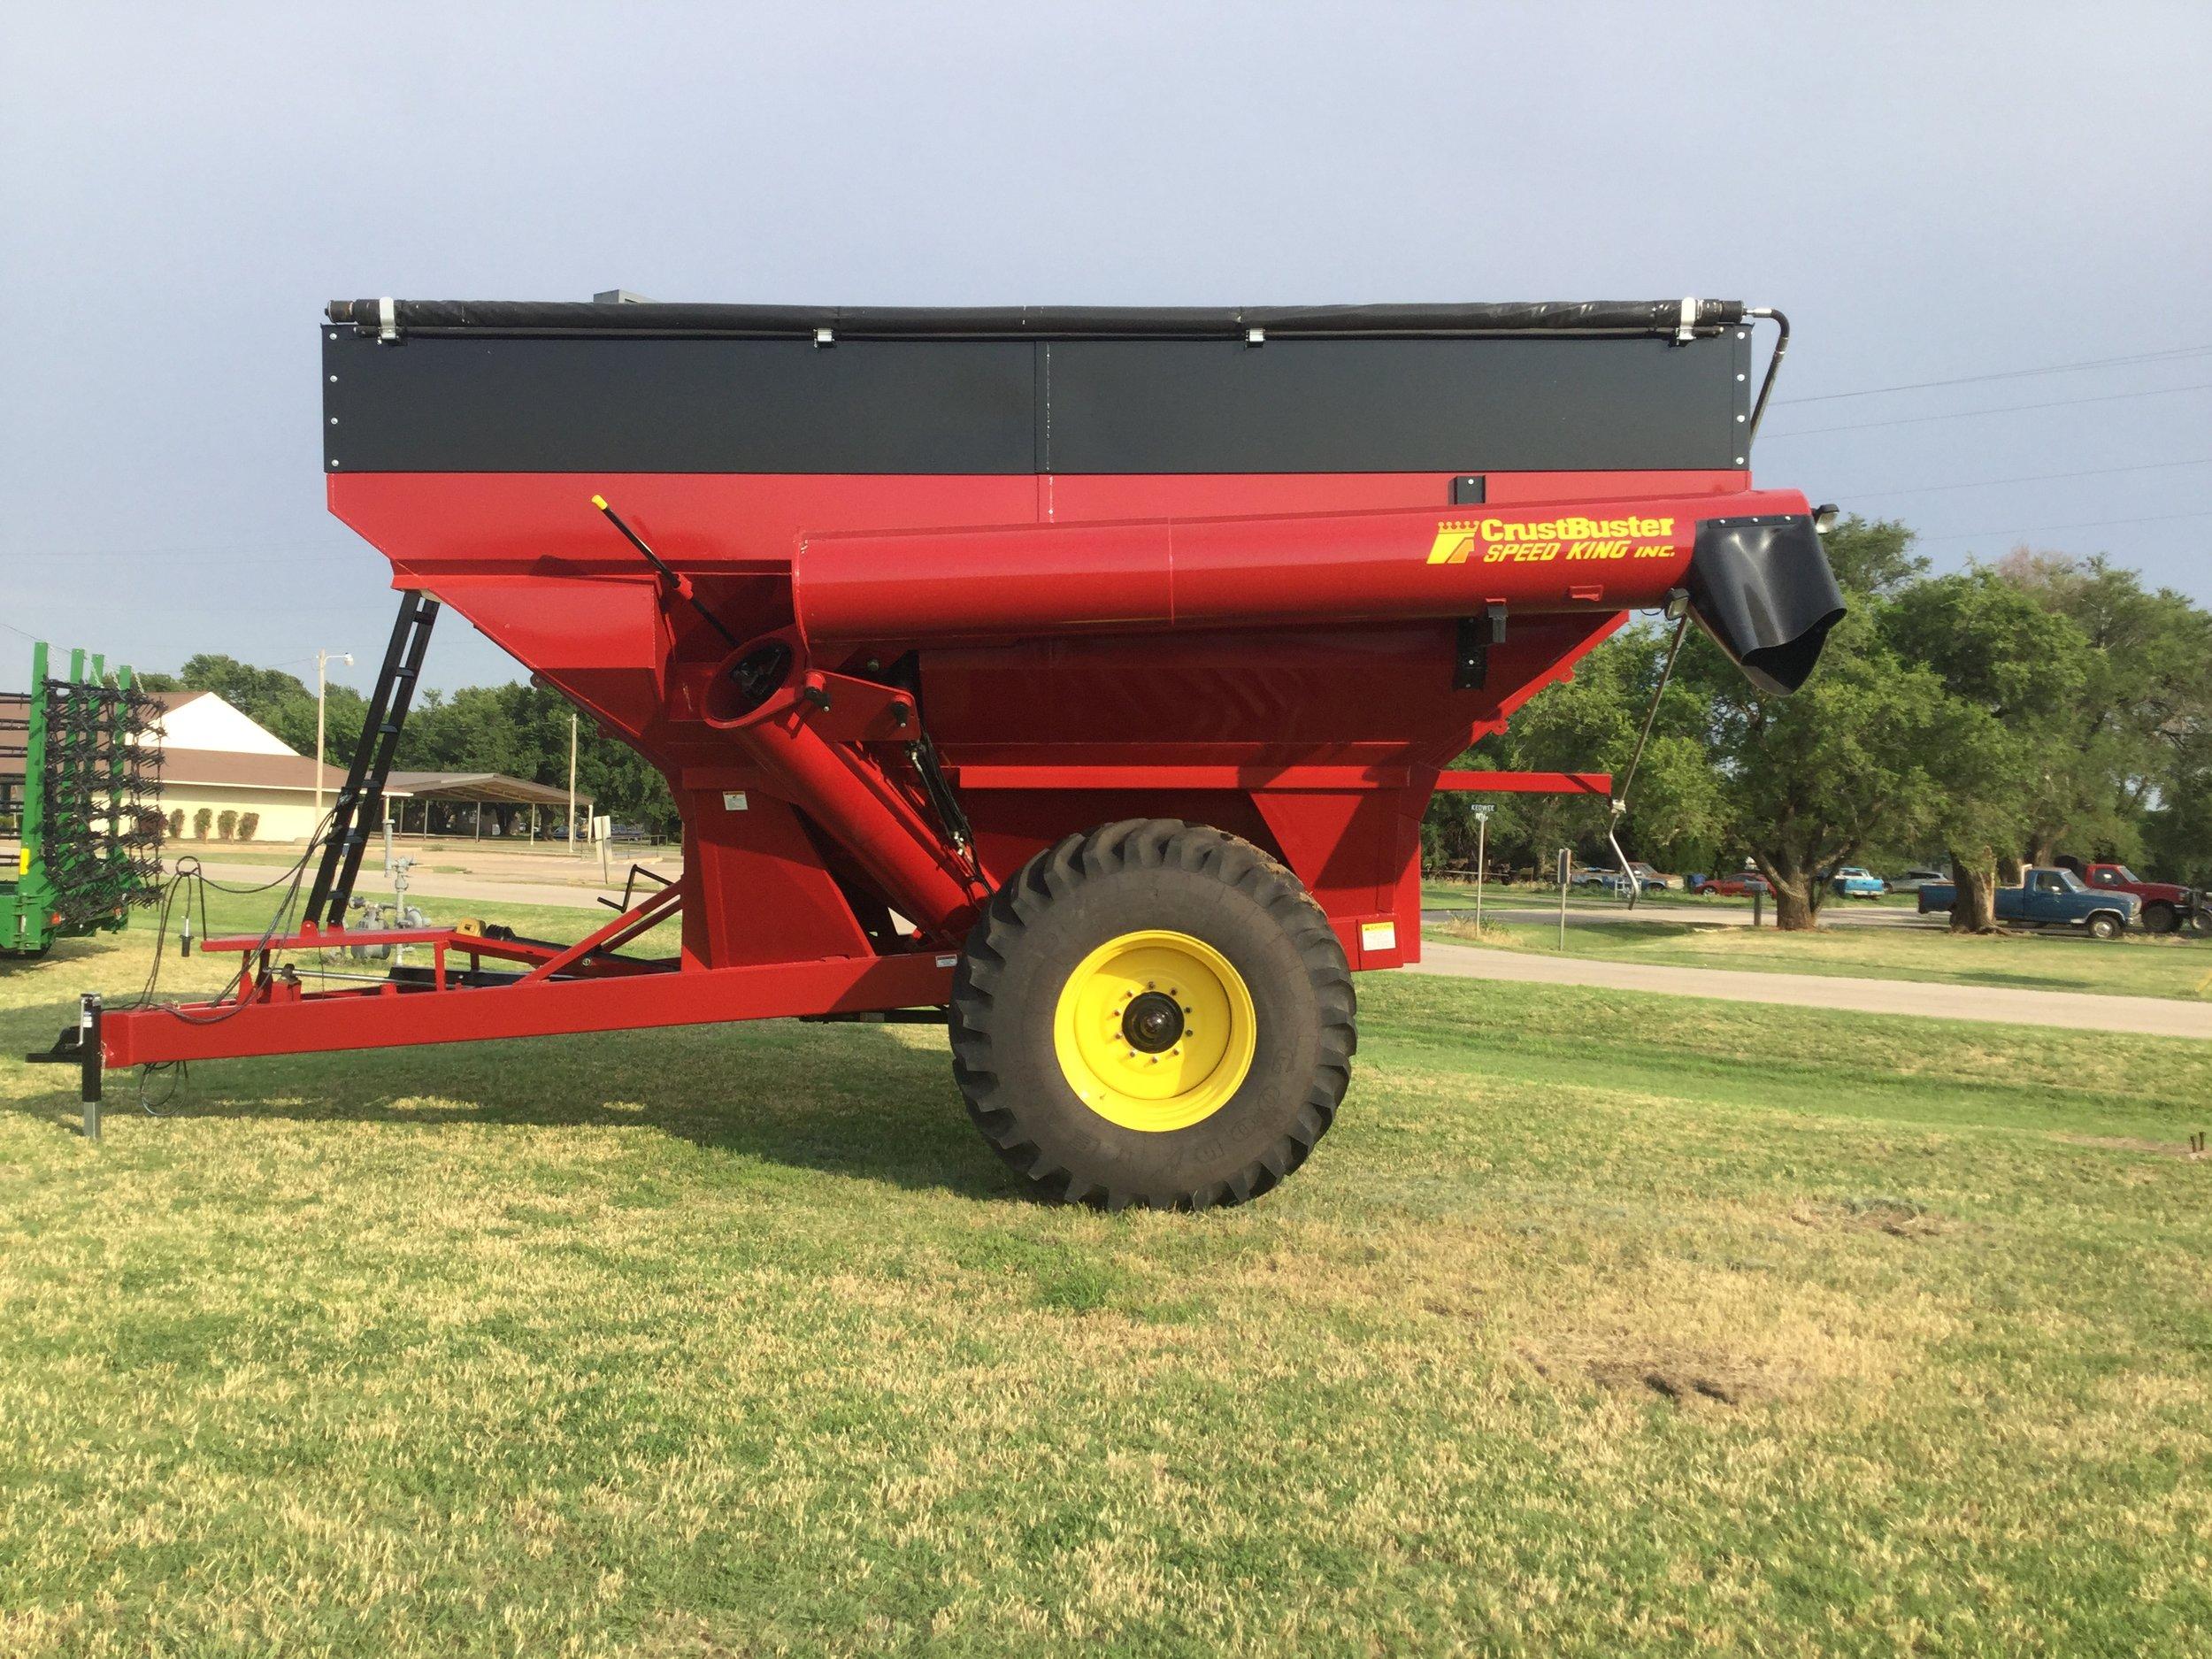 CrustBuster Grain Cart - Call for Price